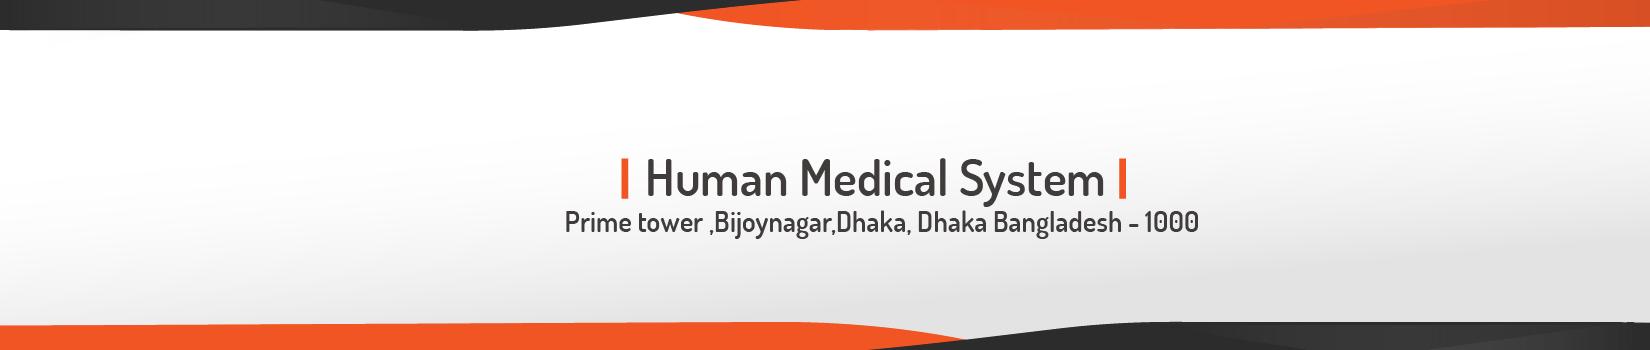 Human Medical System